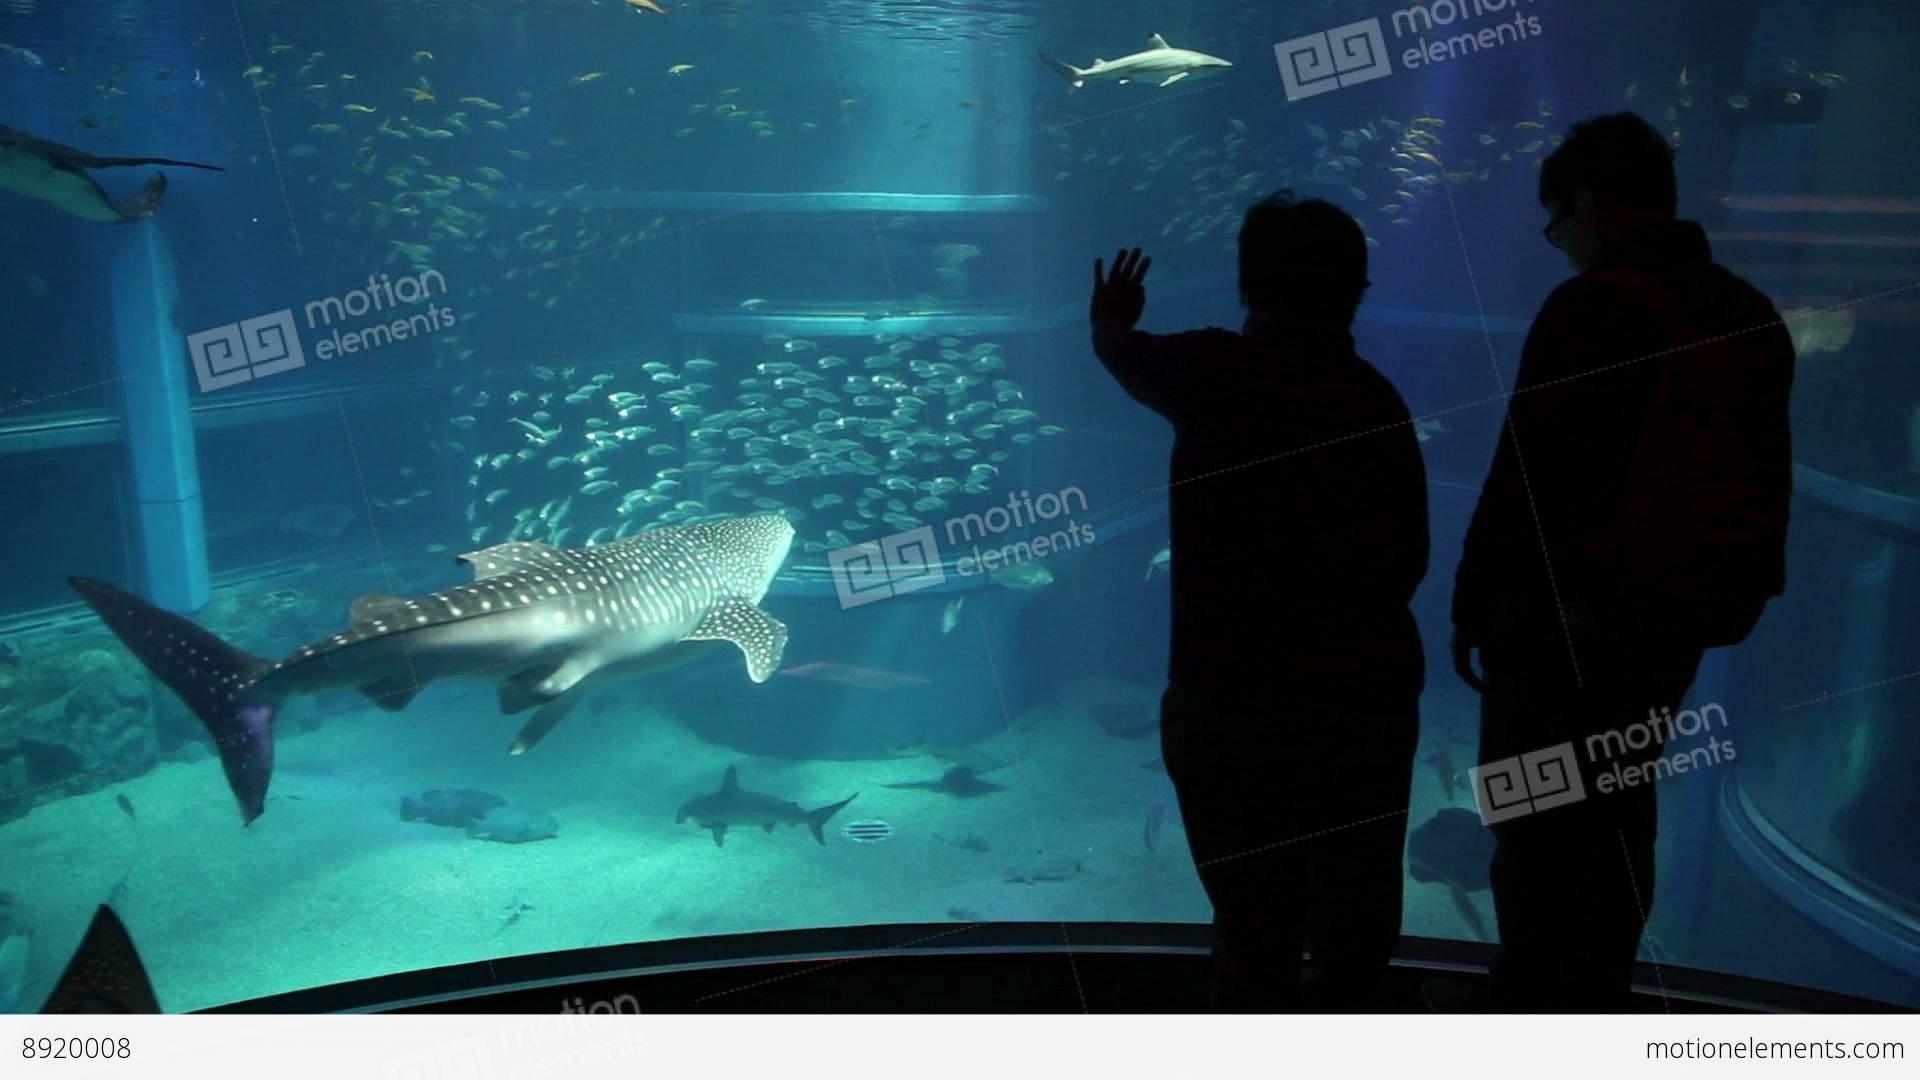 Fish aquarium japan - 6of 10 Fish Whale Shark Animals At Osaka Aquarium Stock